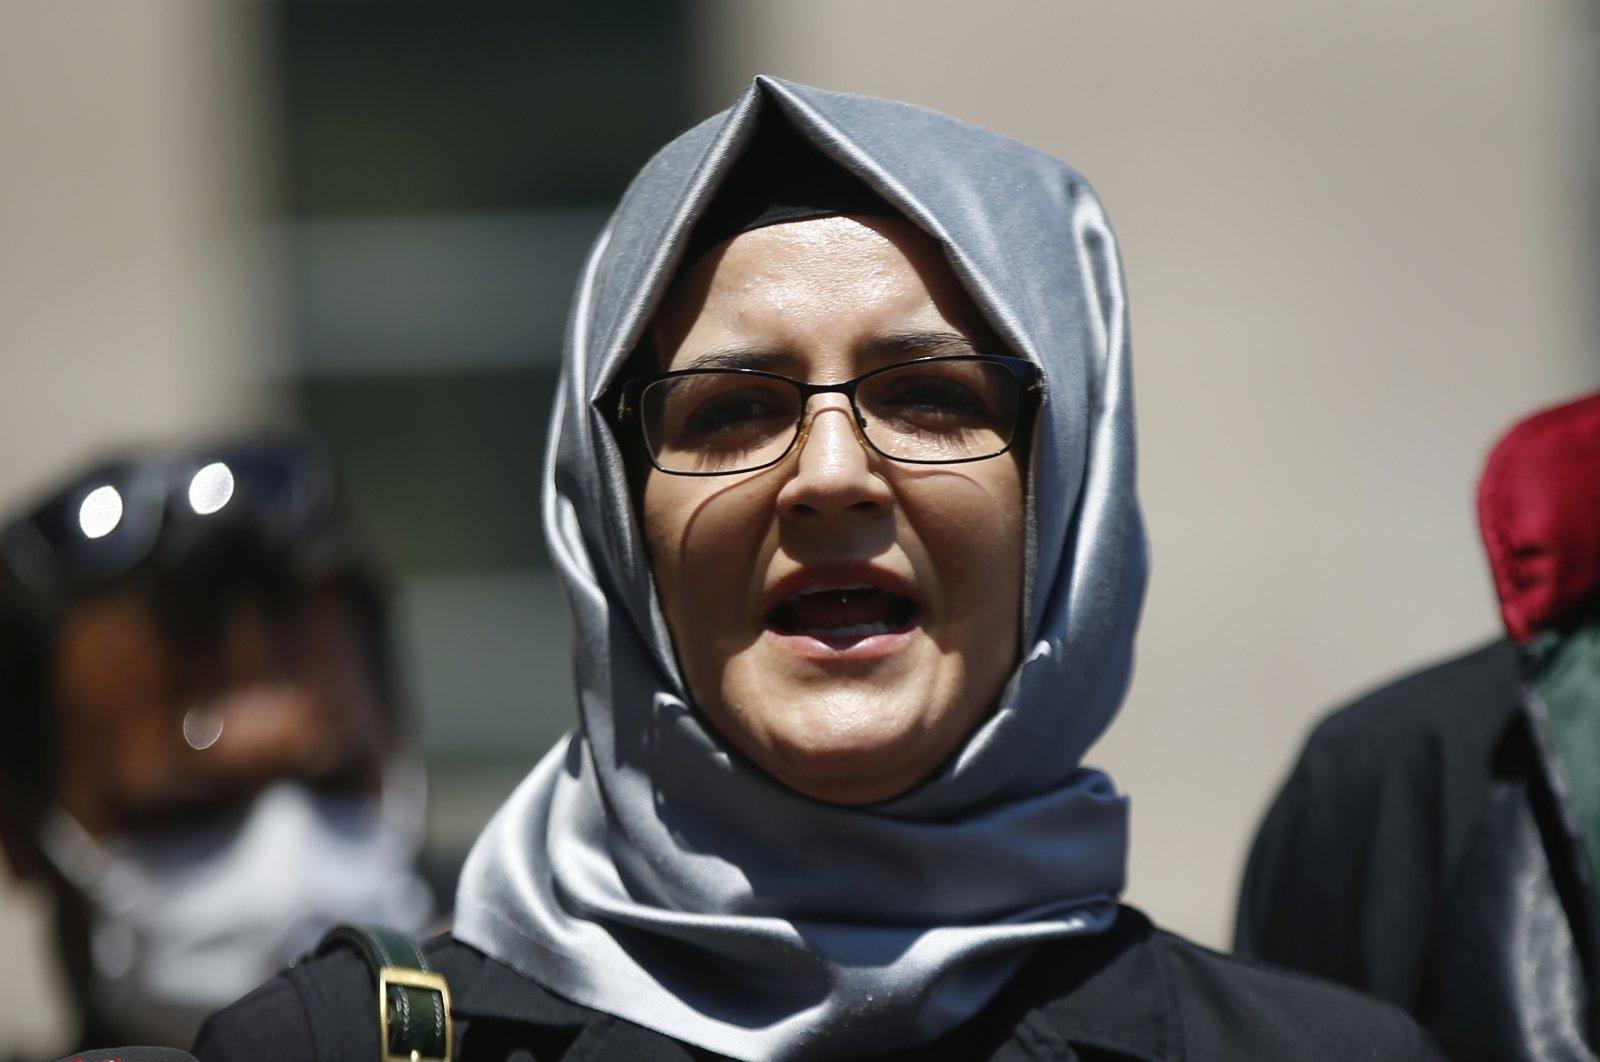 Hatice Cengiz, the fiancee of slain Saudi journalist Jamal Khashoggi, talks to members of the media in Istanbul, Turkey, July 3, 2020. (AP Photo)